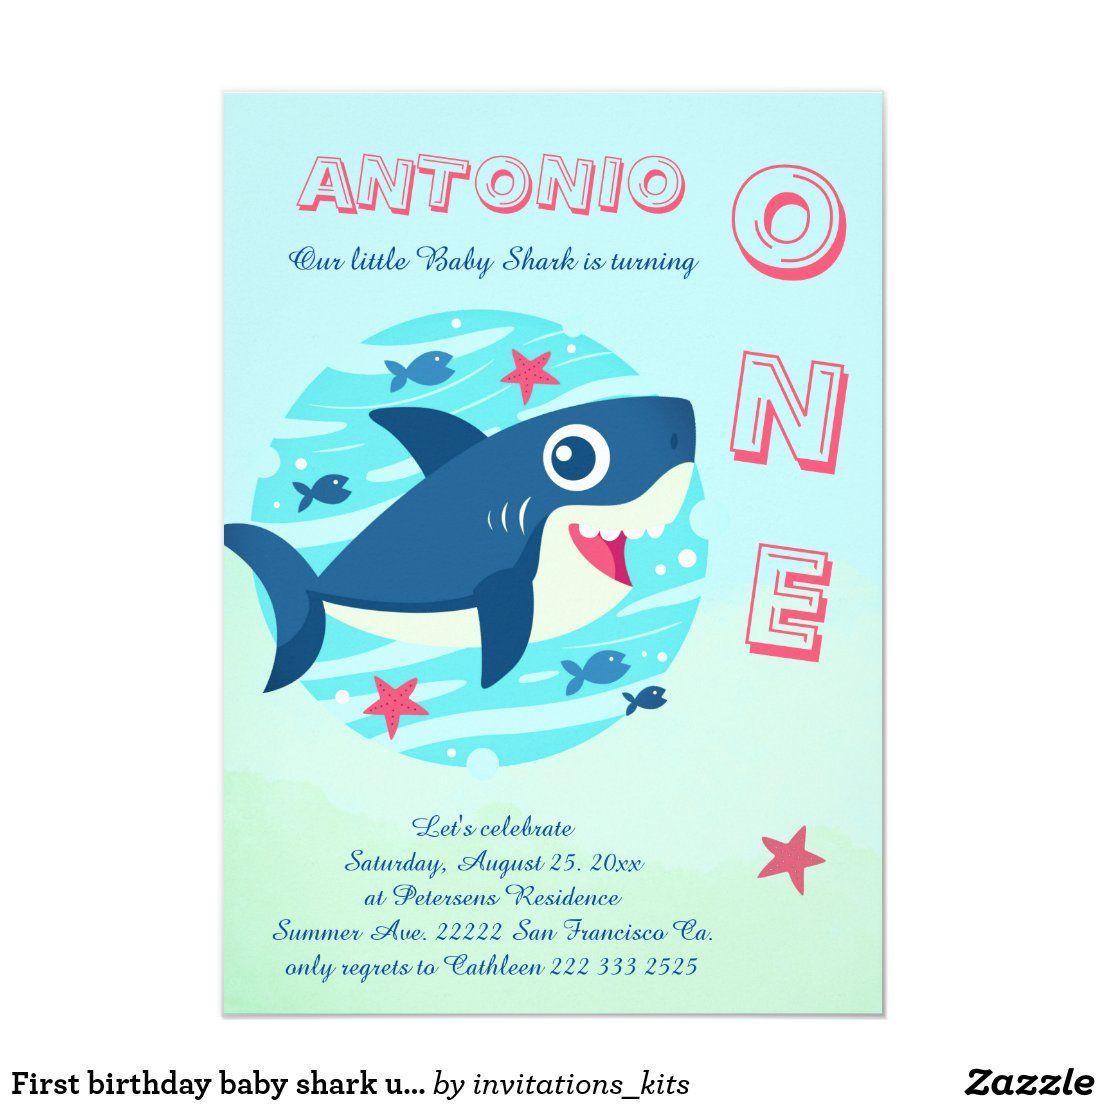 First birthday baby shark under the sea blue invitation